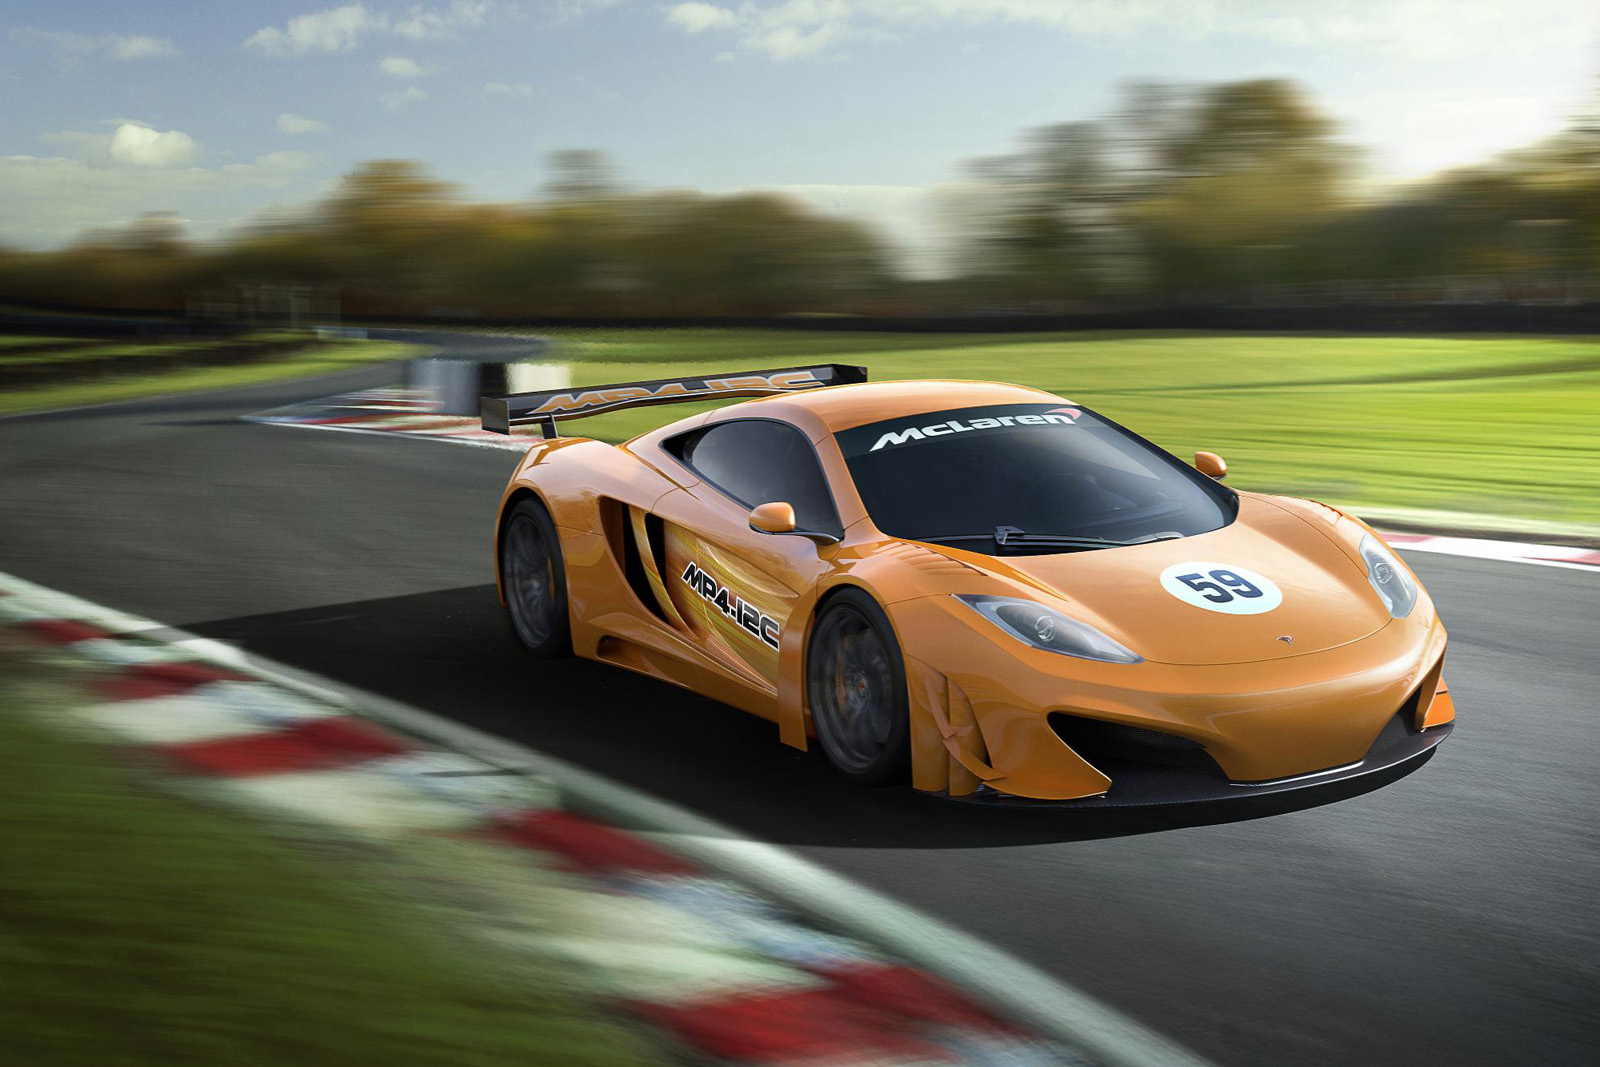 Beautiful Car Races Video Illustration - Classic Cars Ideas - boiq.info